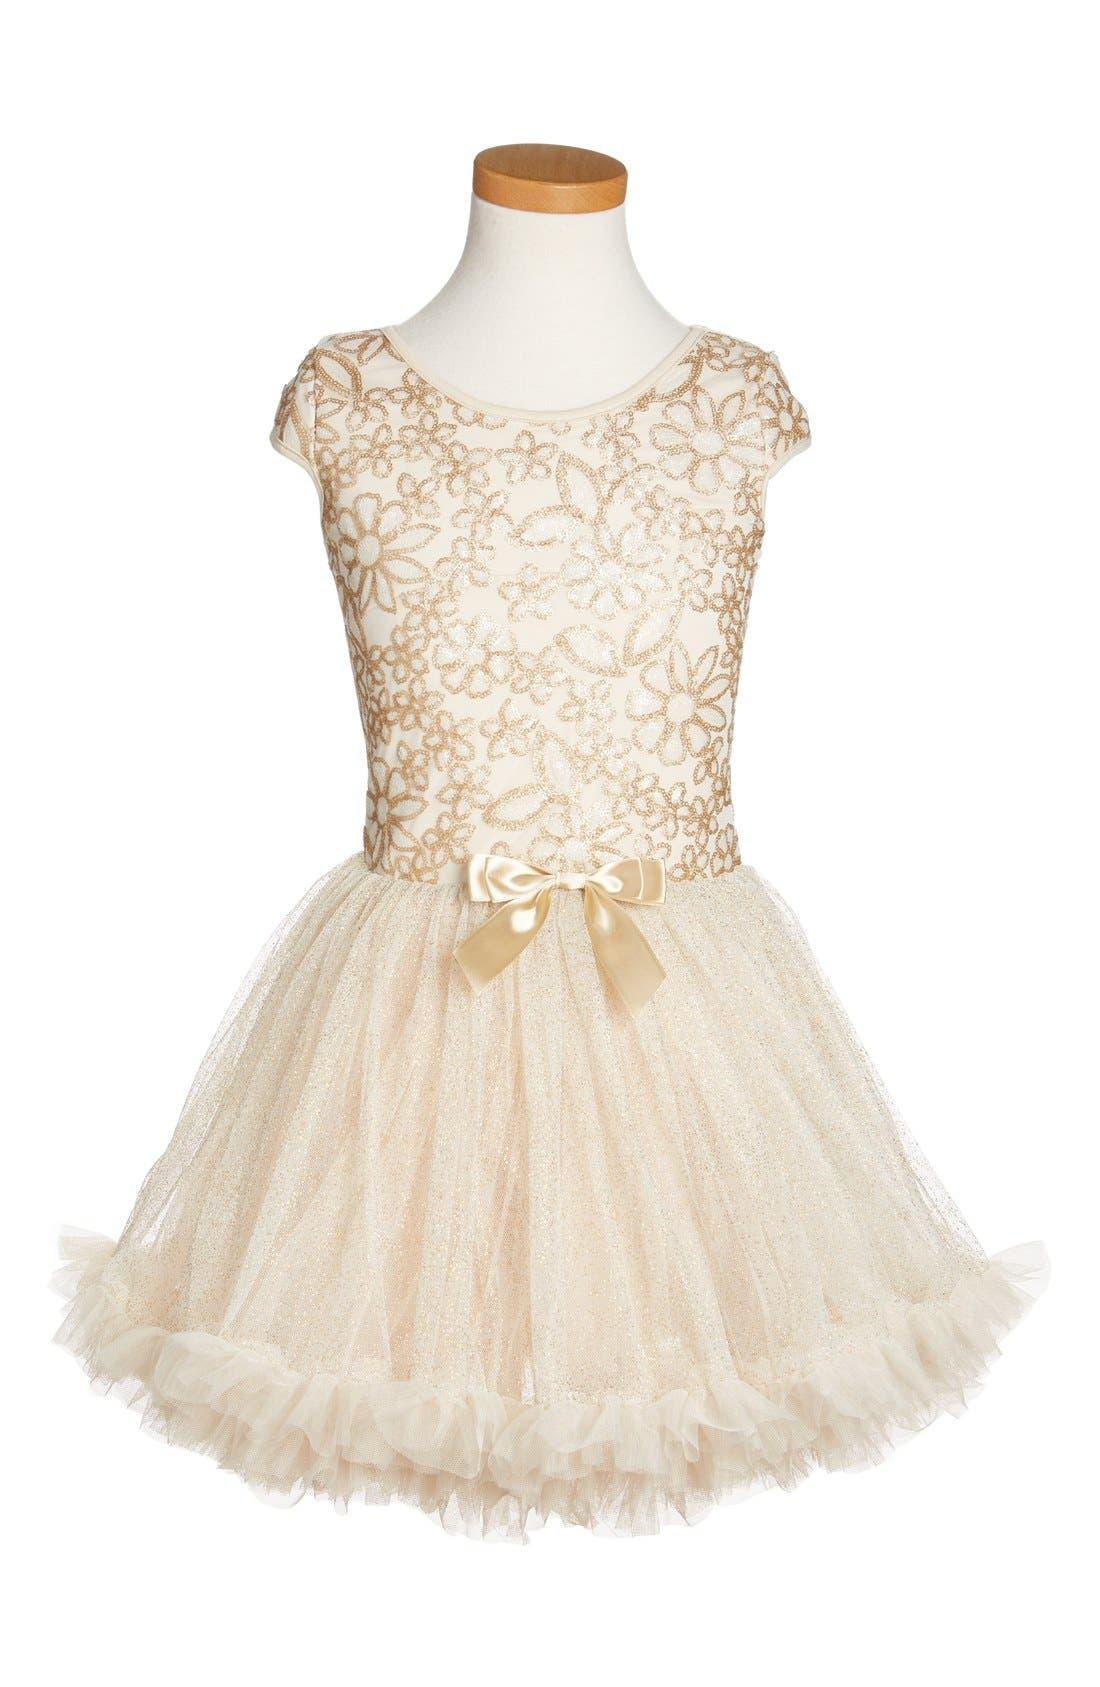 POPATU, Sequin Cap Sleeve Dress, Main thumbnail 1, color, GOLD